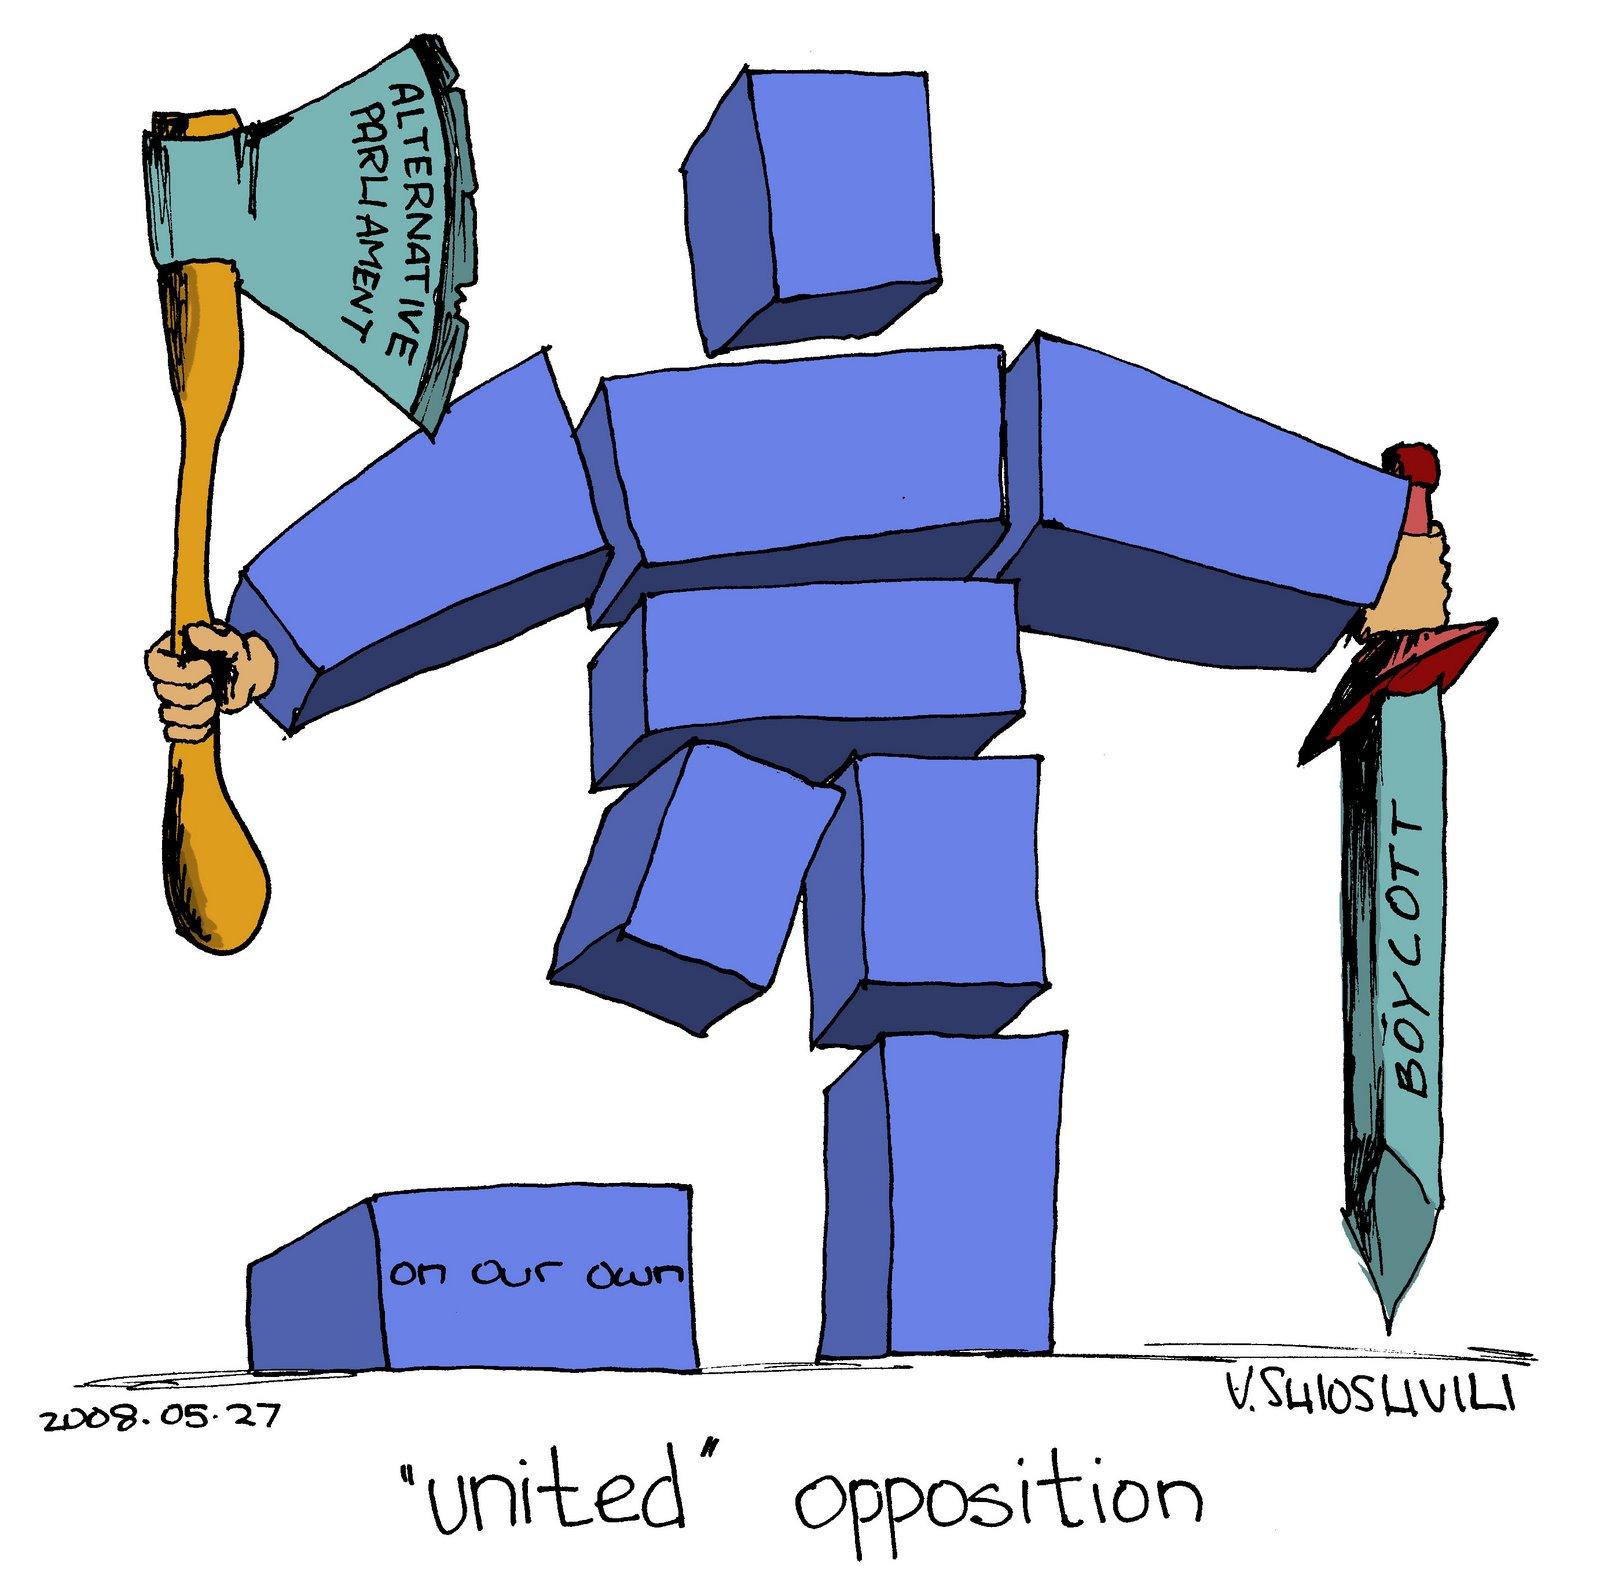 [_united_+opposition+color.jpg]